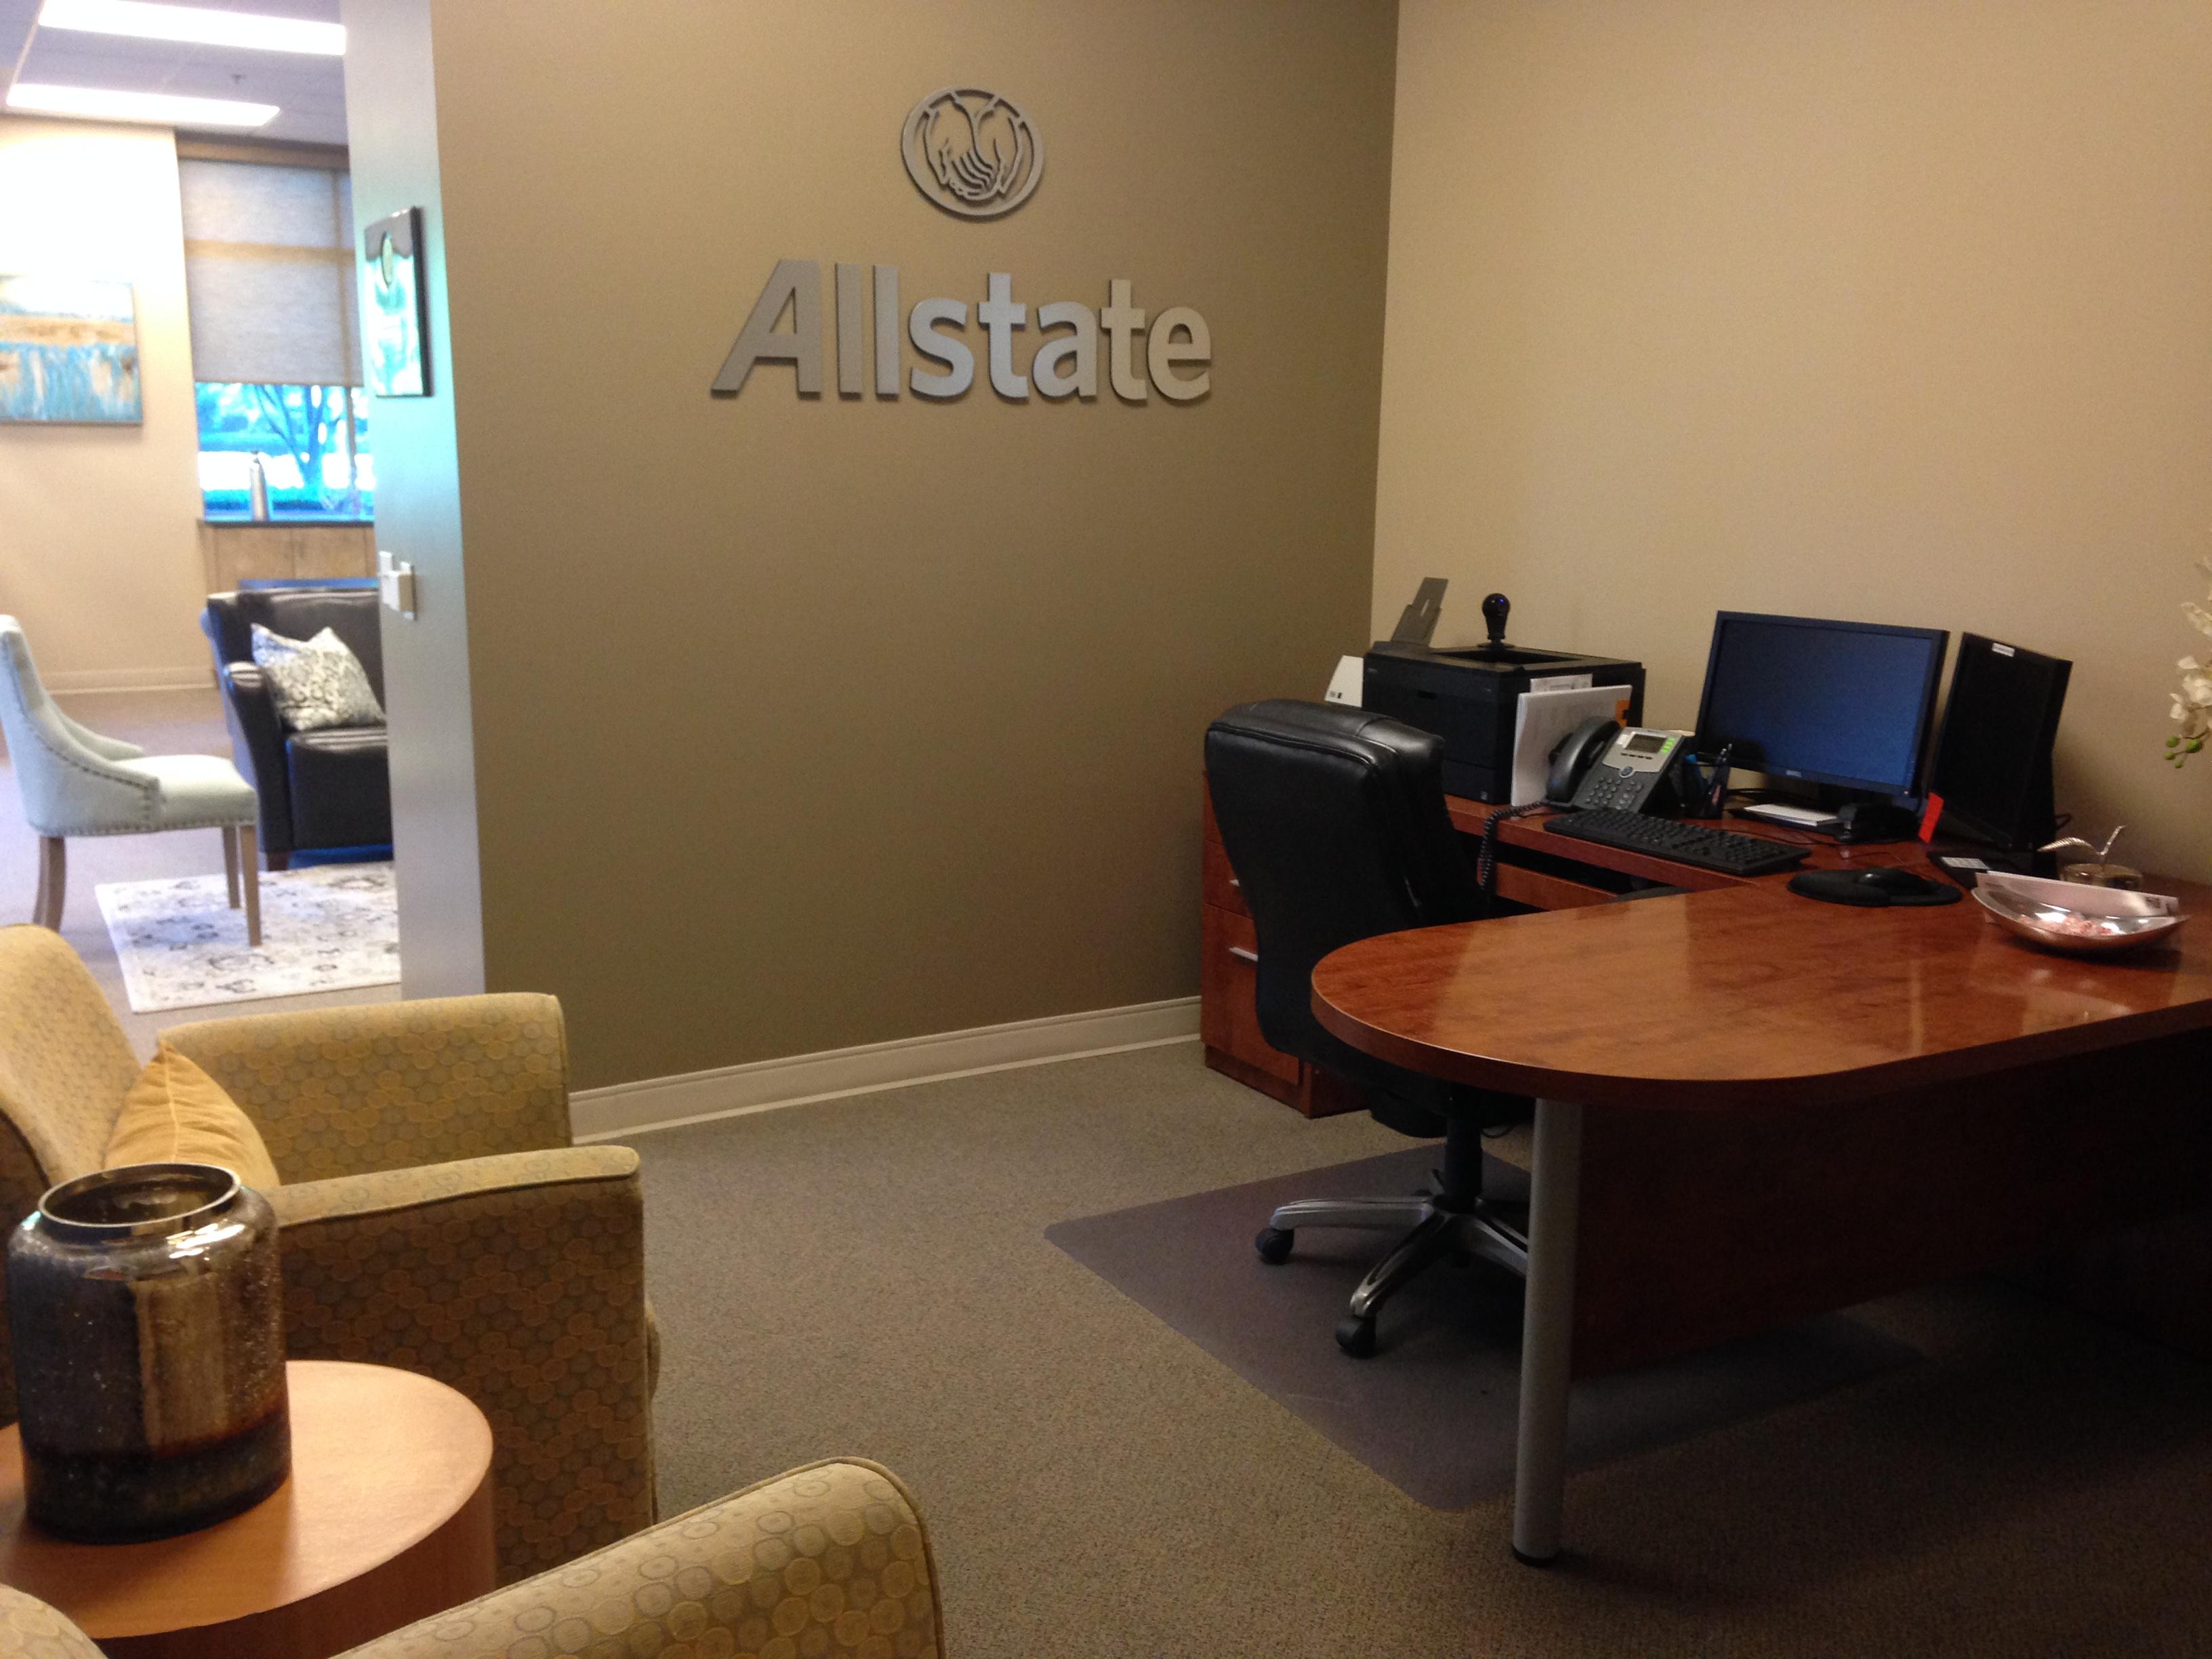 Tim Delaney: Allstate Insurance image 1